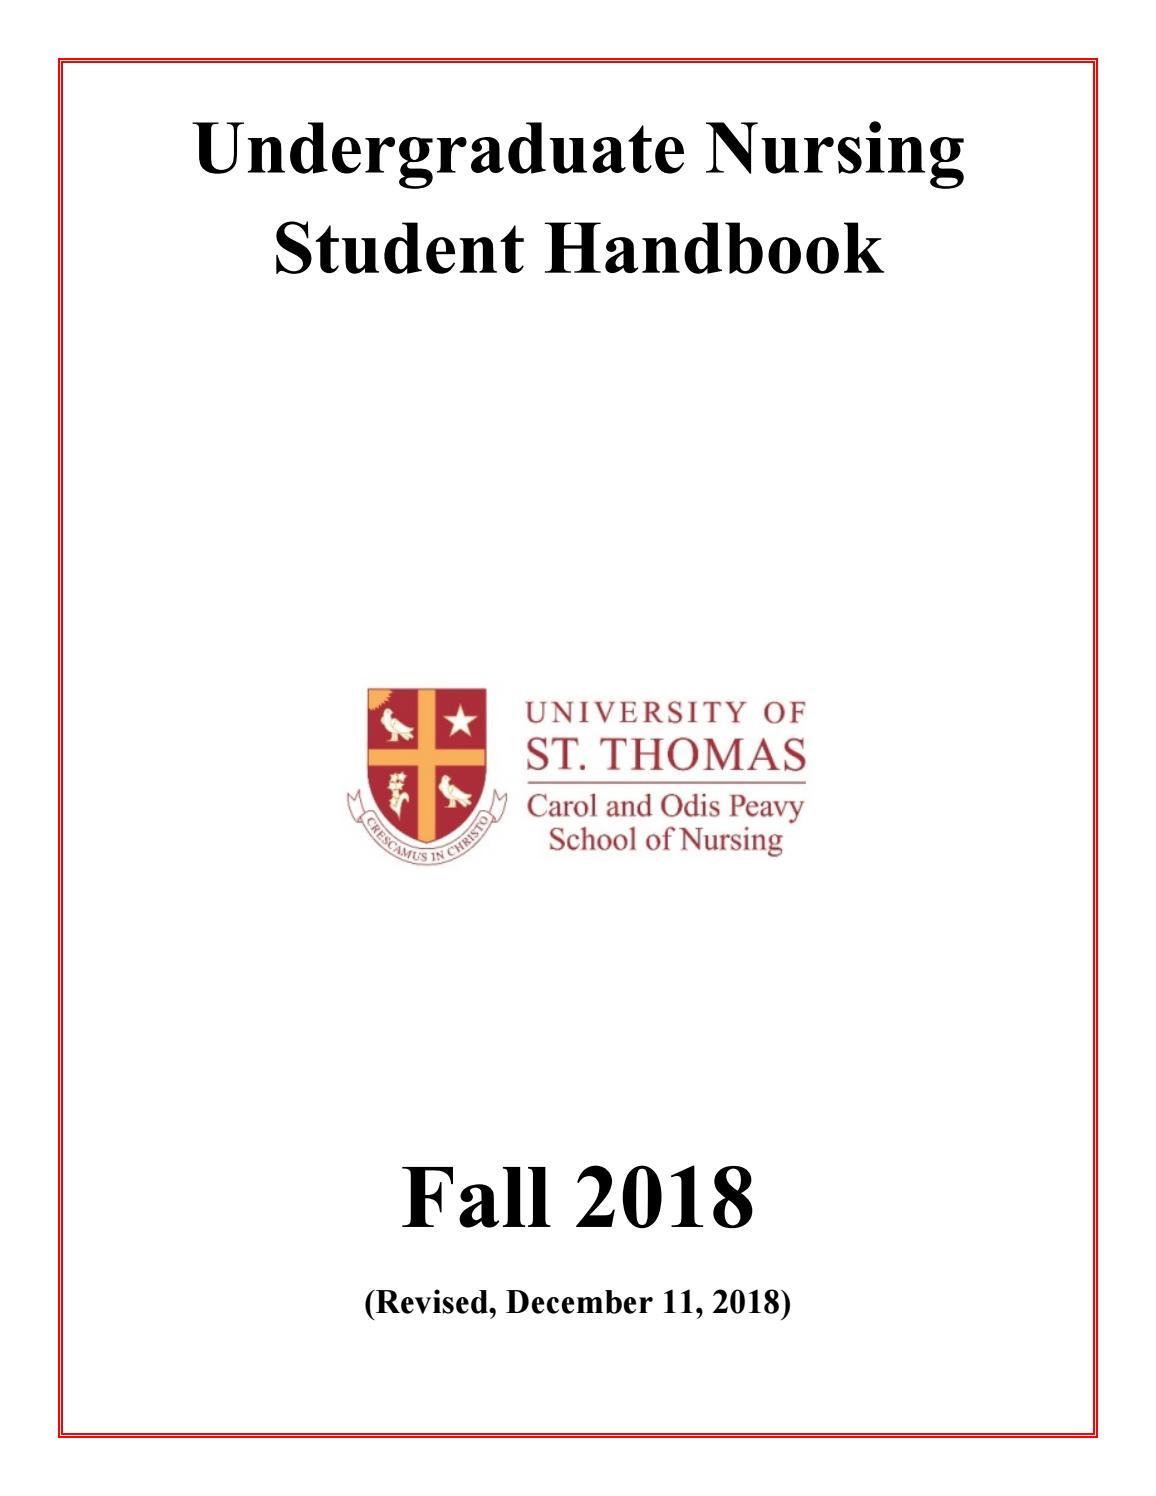 University of St  Thomas Peavy School of Nursing Handbook